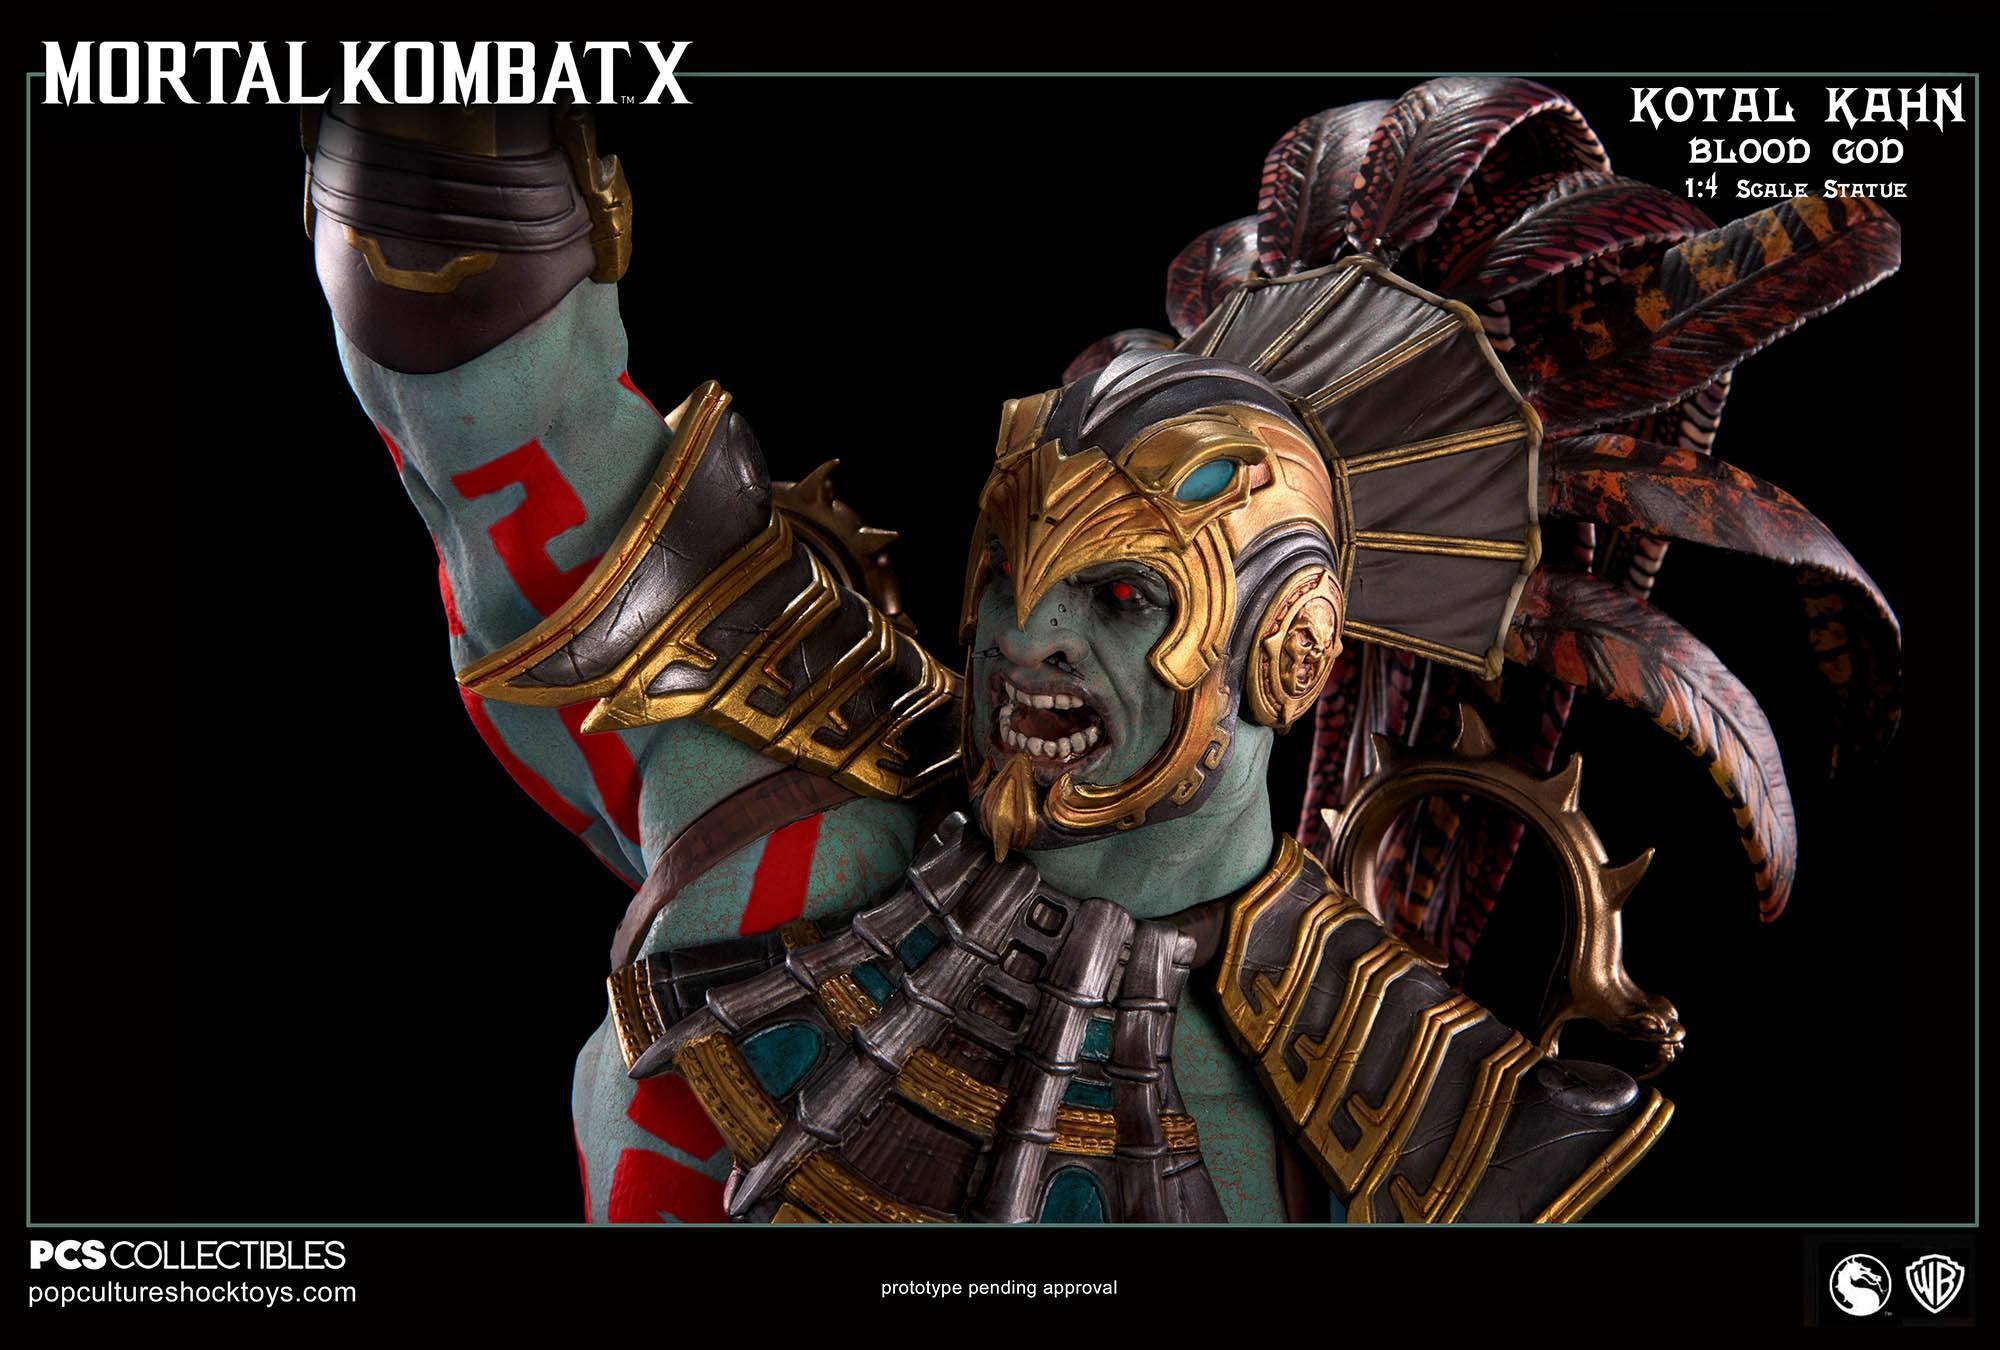 [Pop Culture Shock] Mortal Kombat X: Kotal Kahn 1:4 scale PCS-Kotal-Kahn-Blood-God-018